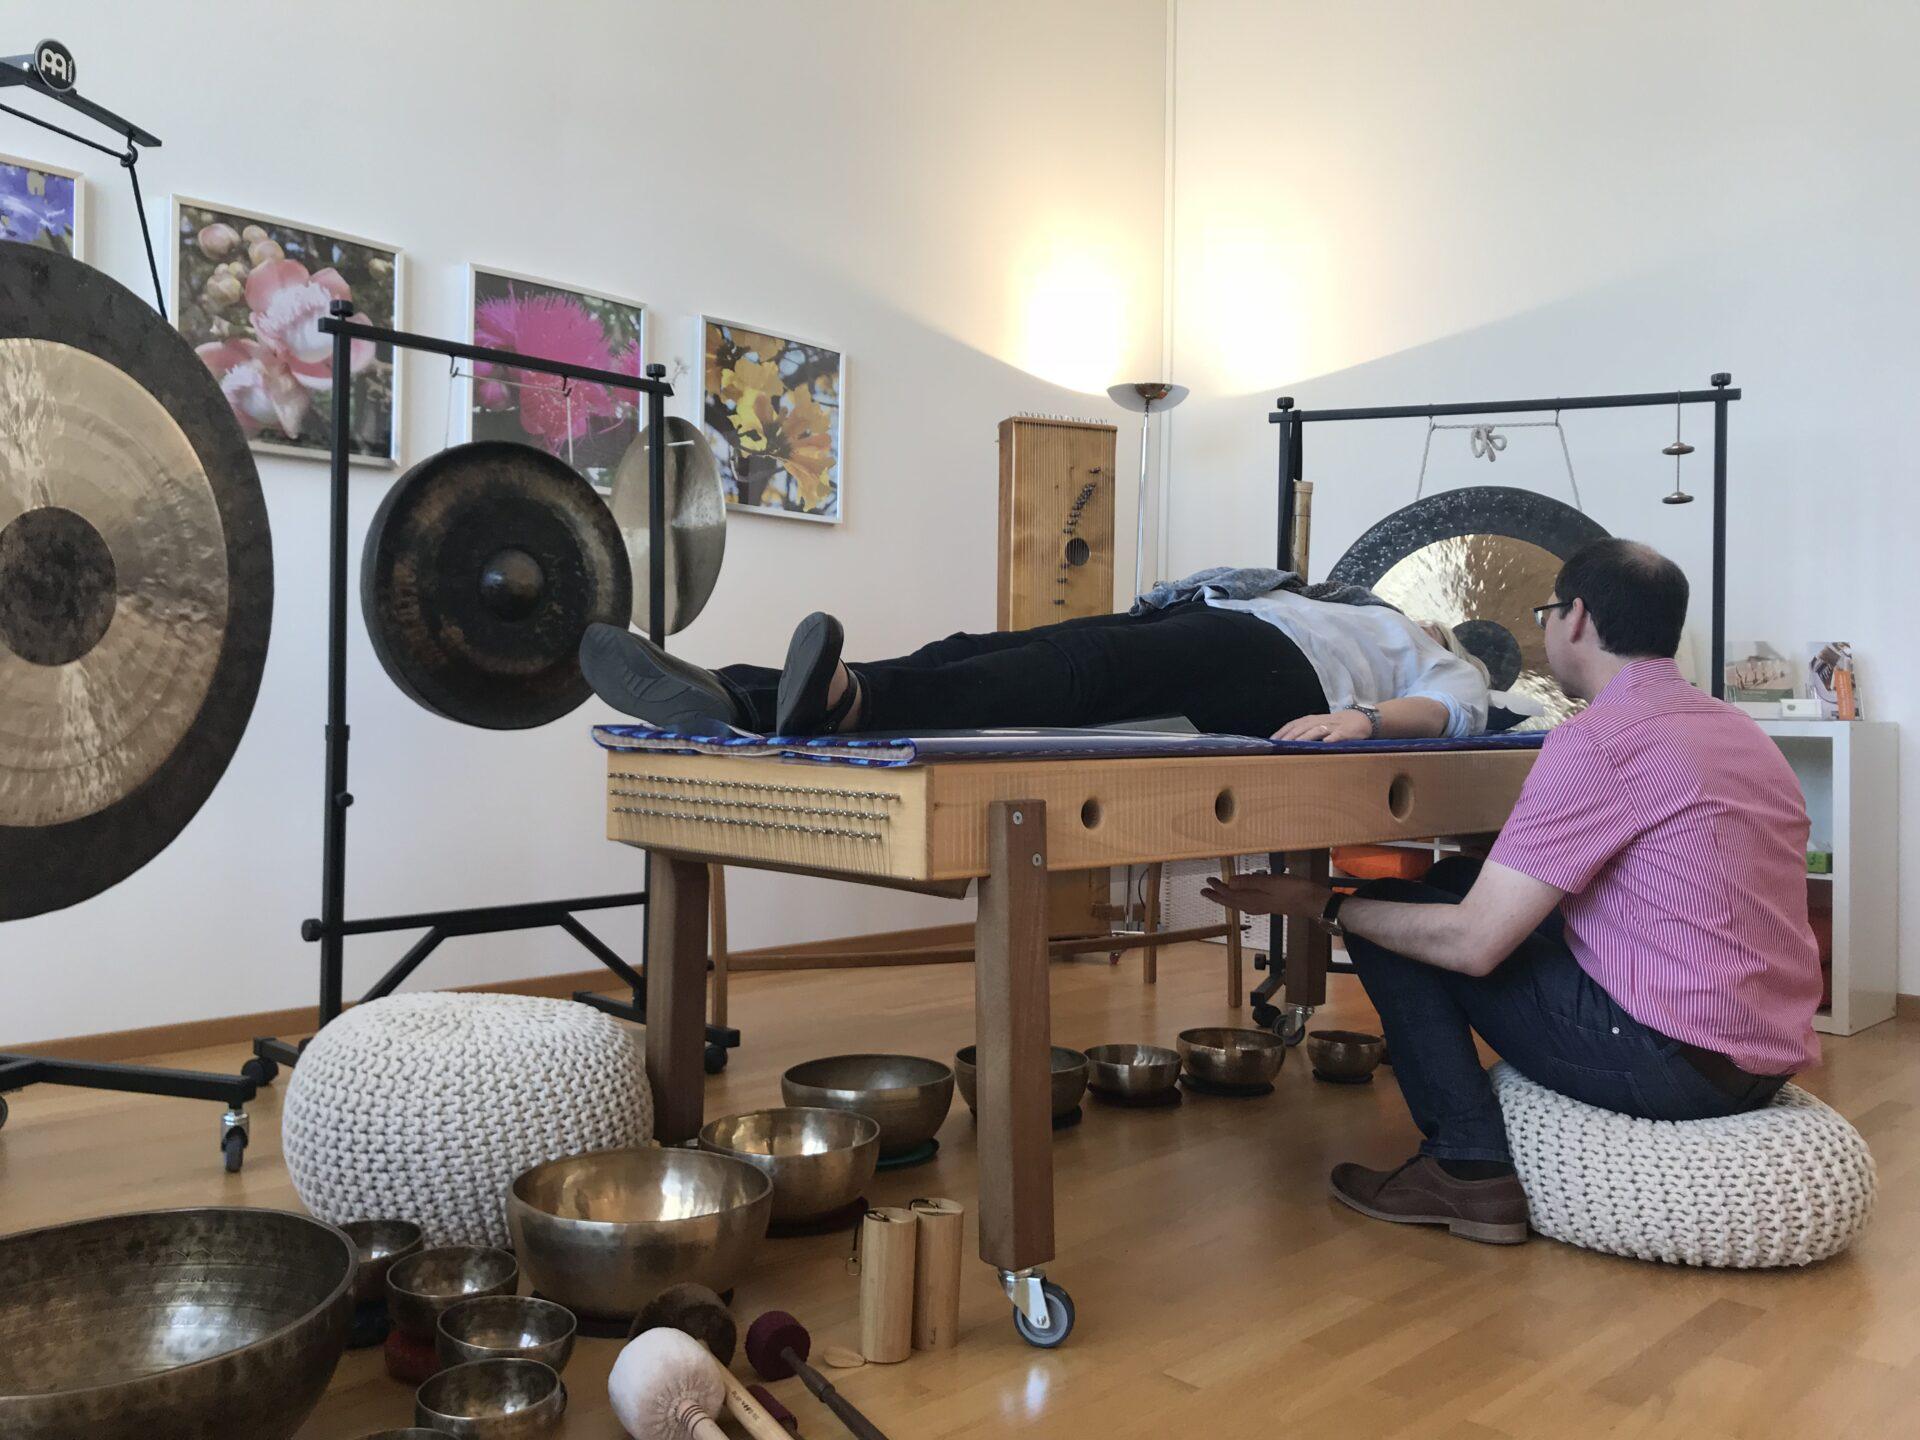 Klangatelier sonantro